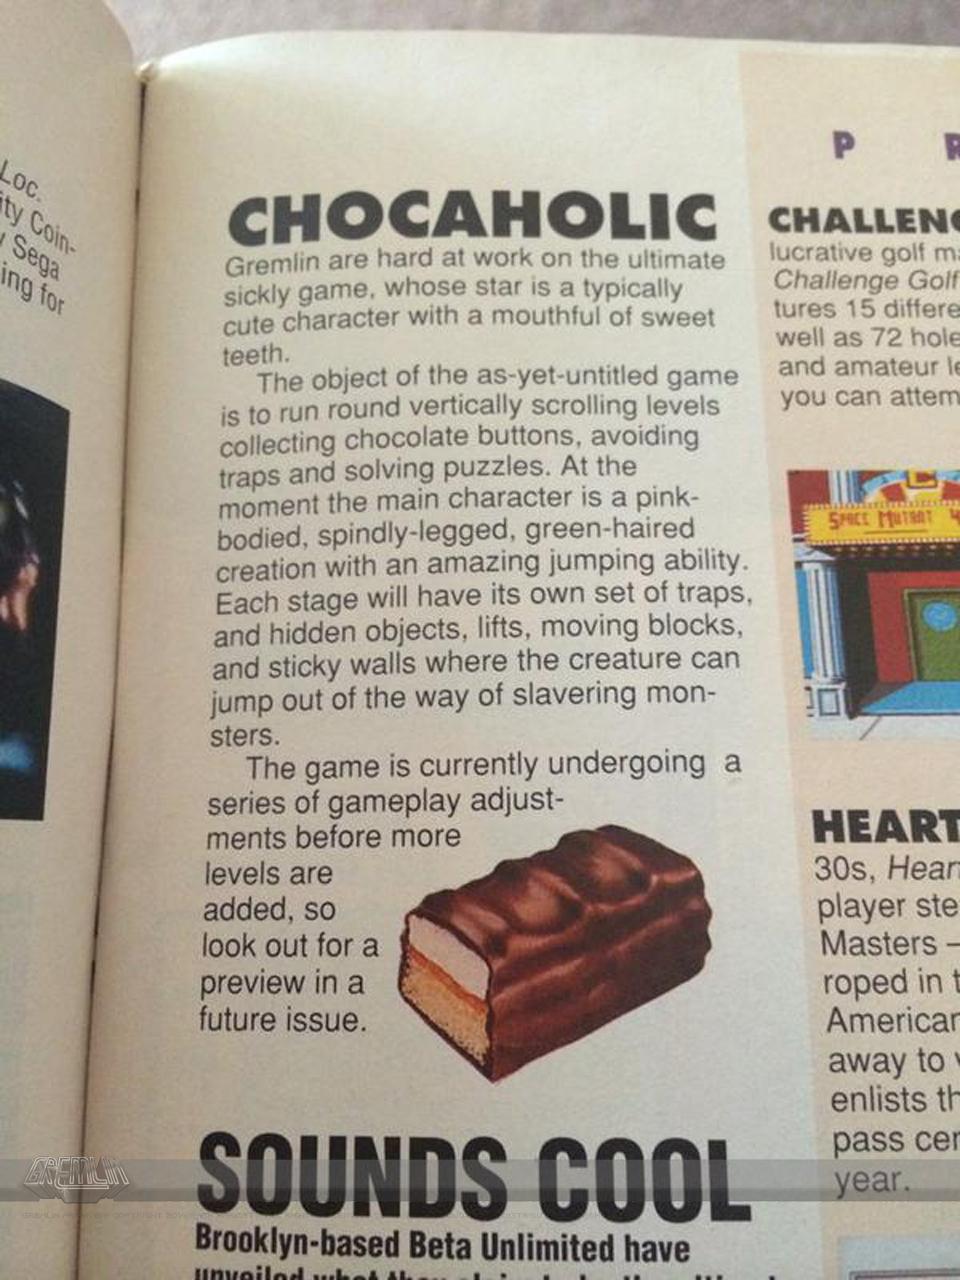 Chocaholic